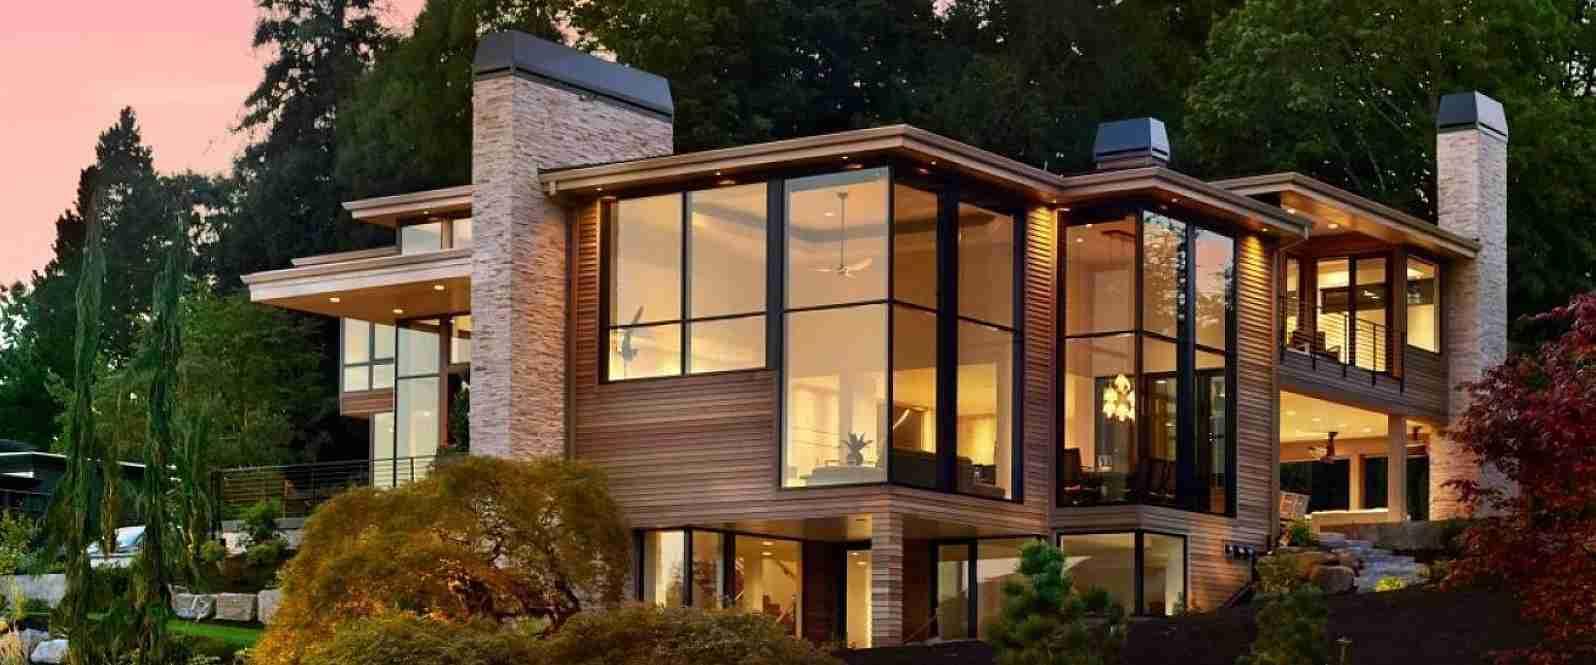 Heritage aluminium windows for listed property; Aluminium Windows Reynaers & Aluminium Windows and Doors Halifax | Marlin Windows